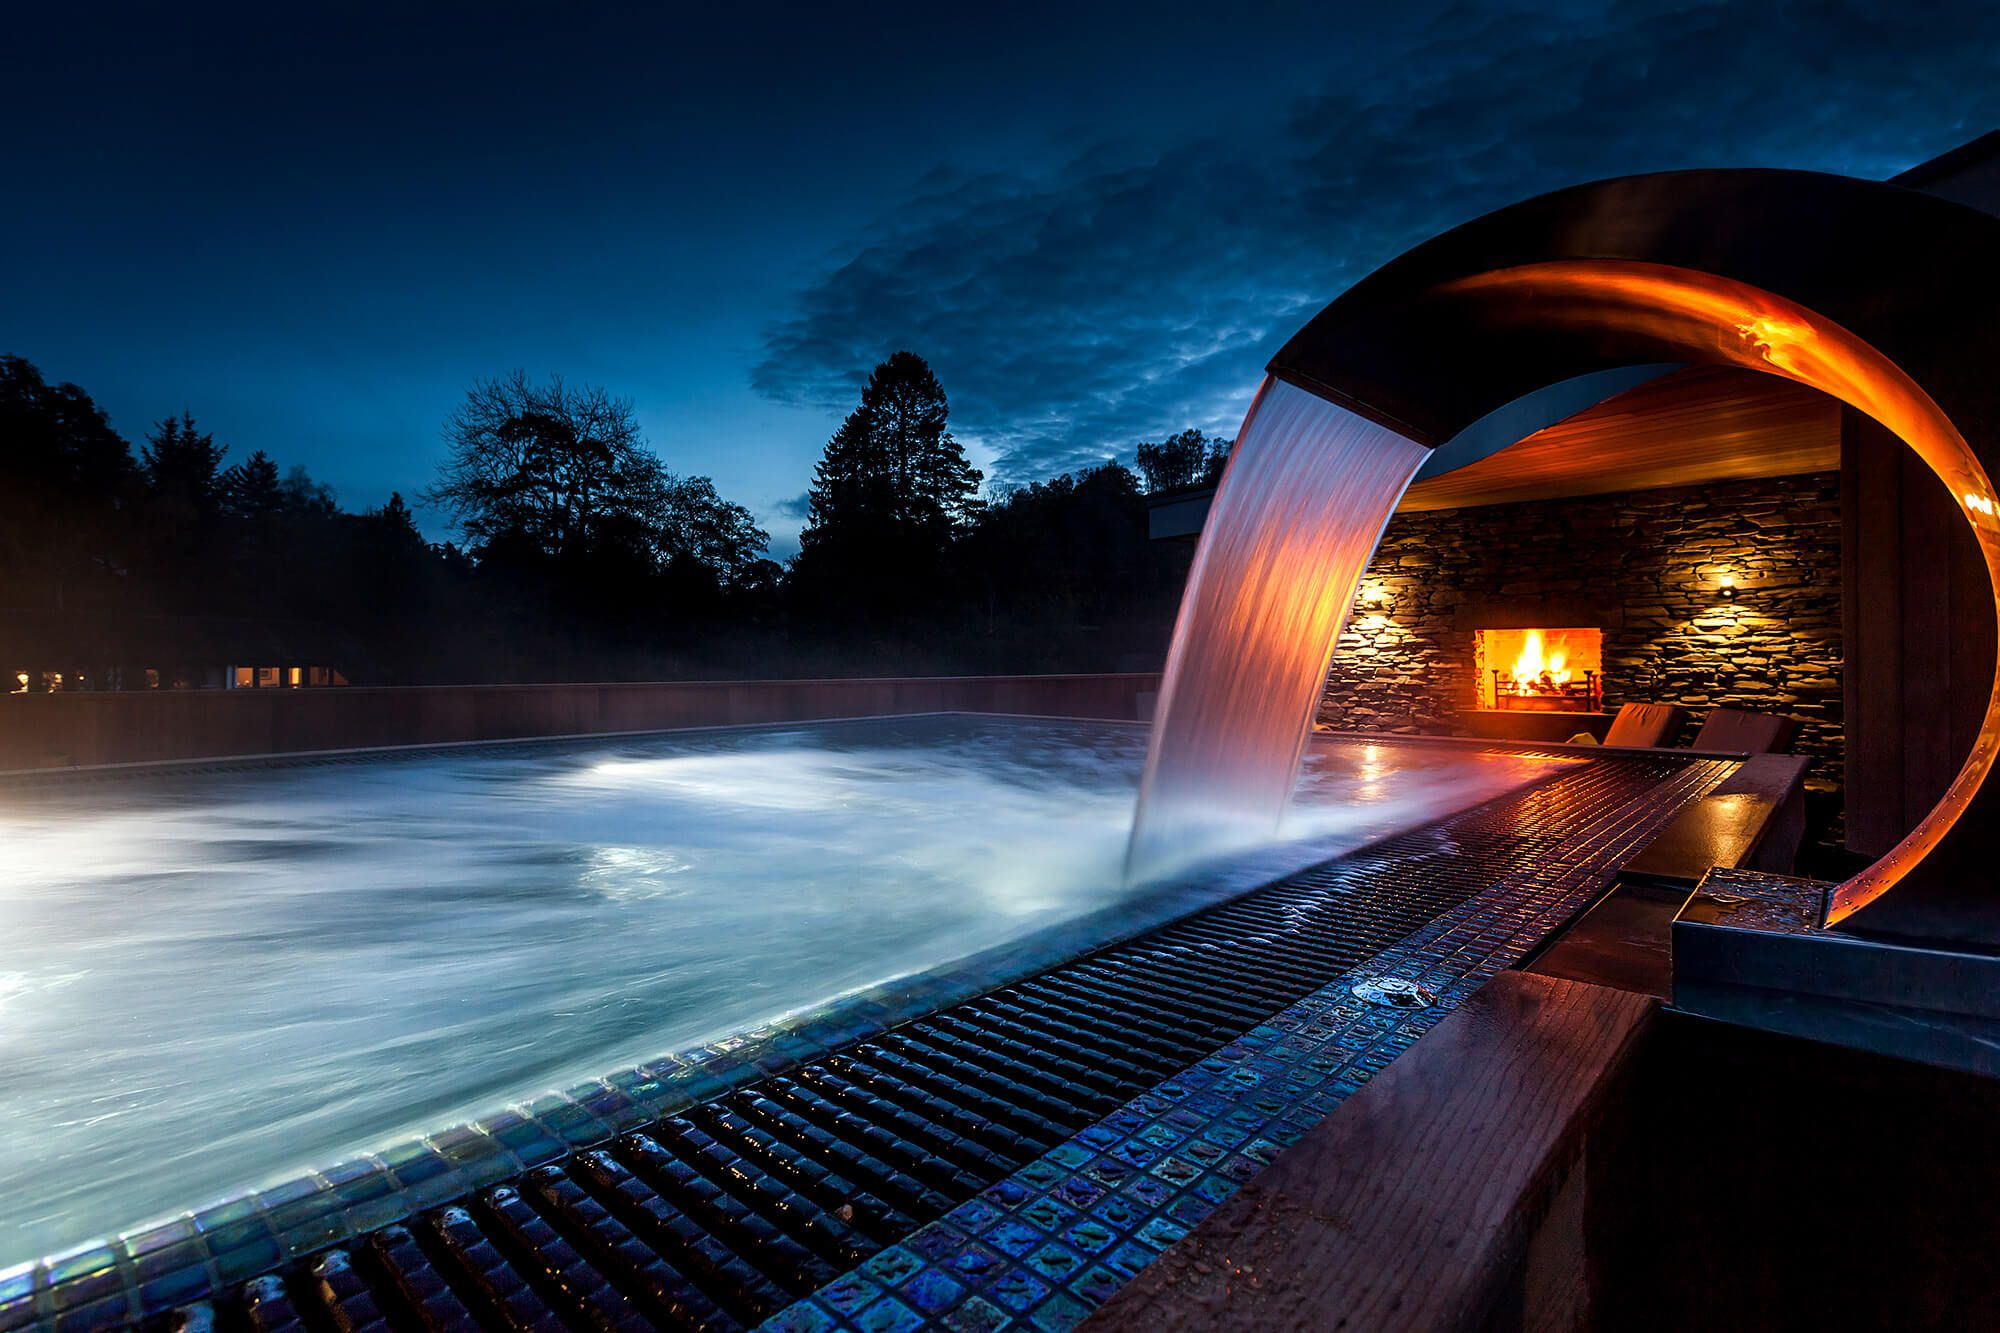 Lake District Hotels 4 Star Langdale Hotel Spa Lake District Lake District Hotels Spa Breaks